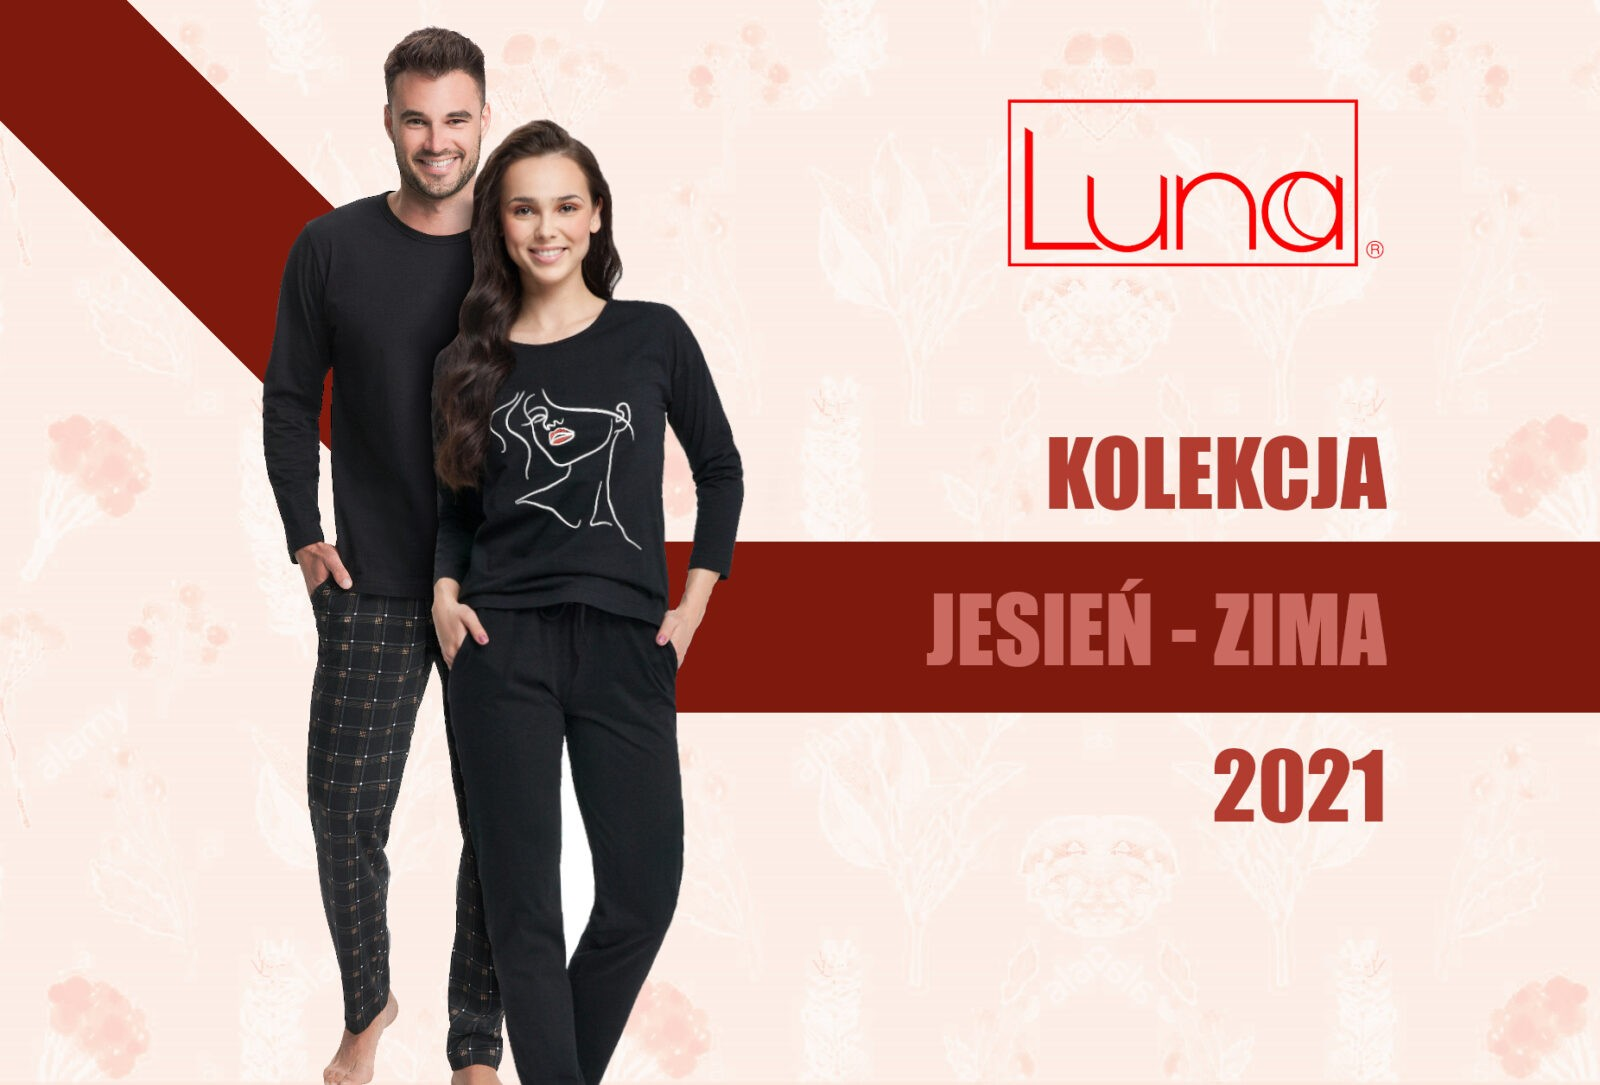 kolekcja jesien-zima 2021 Luna